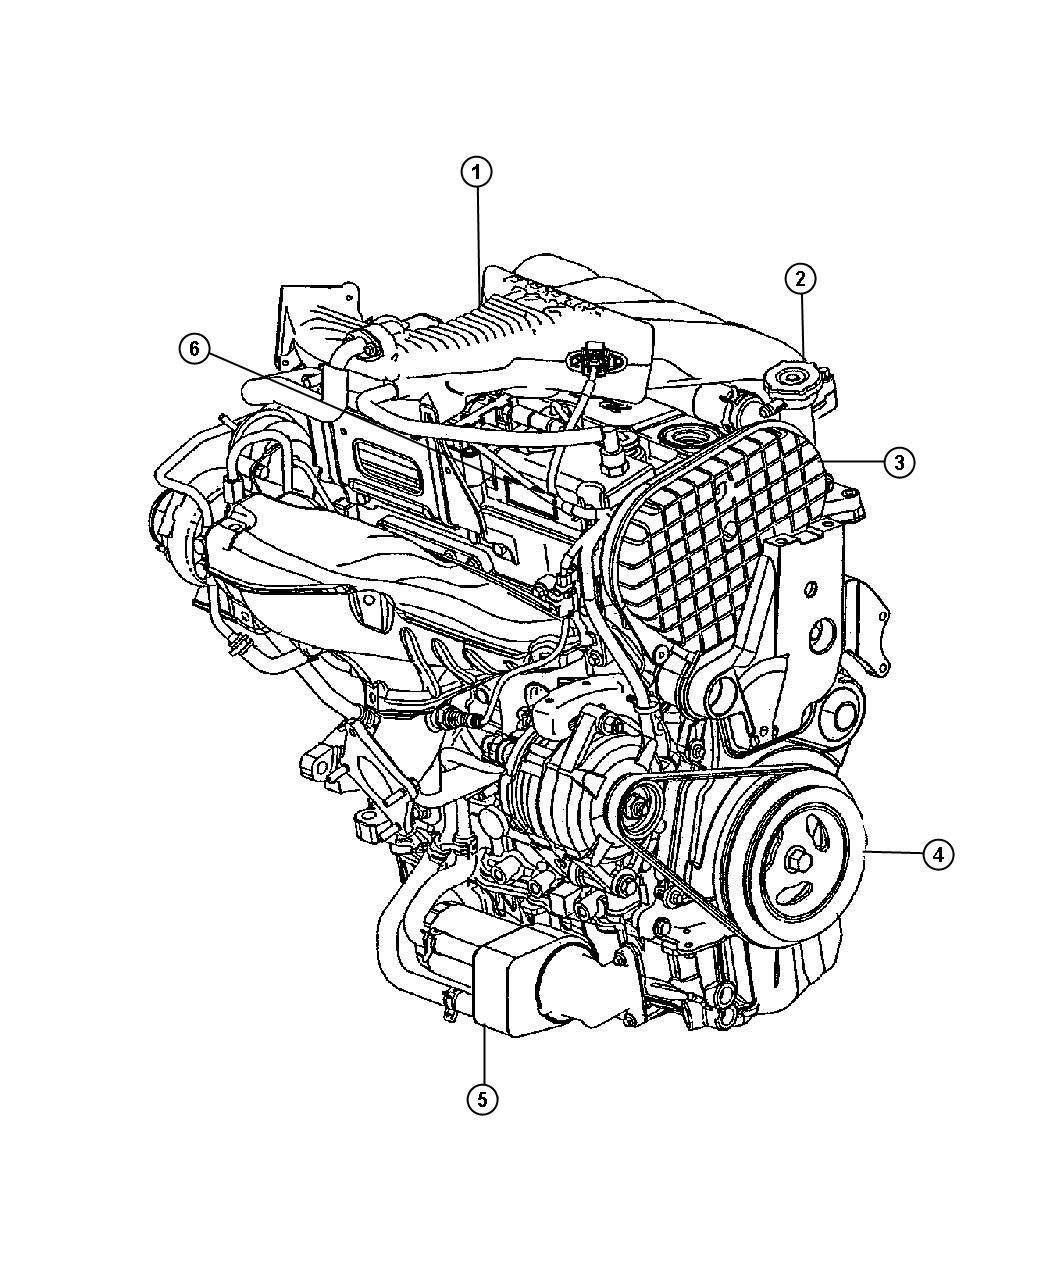 Chrysler Pt Cruiser Engine Long Block Remanufactured